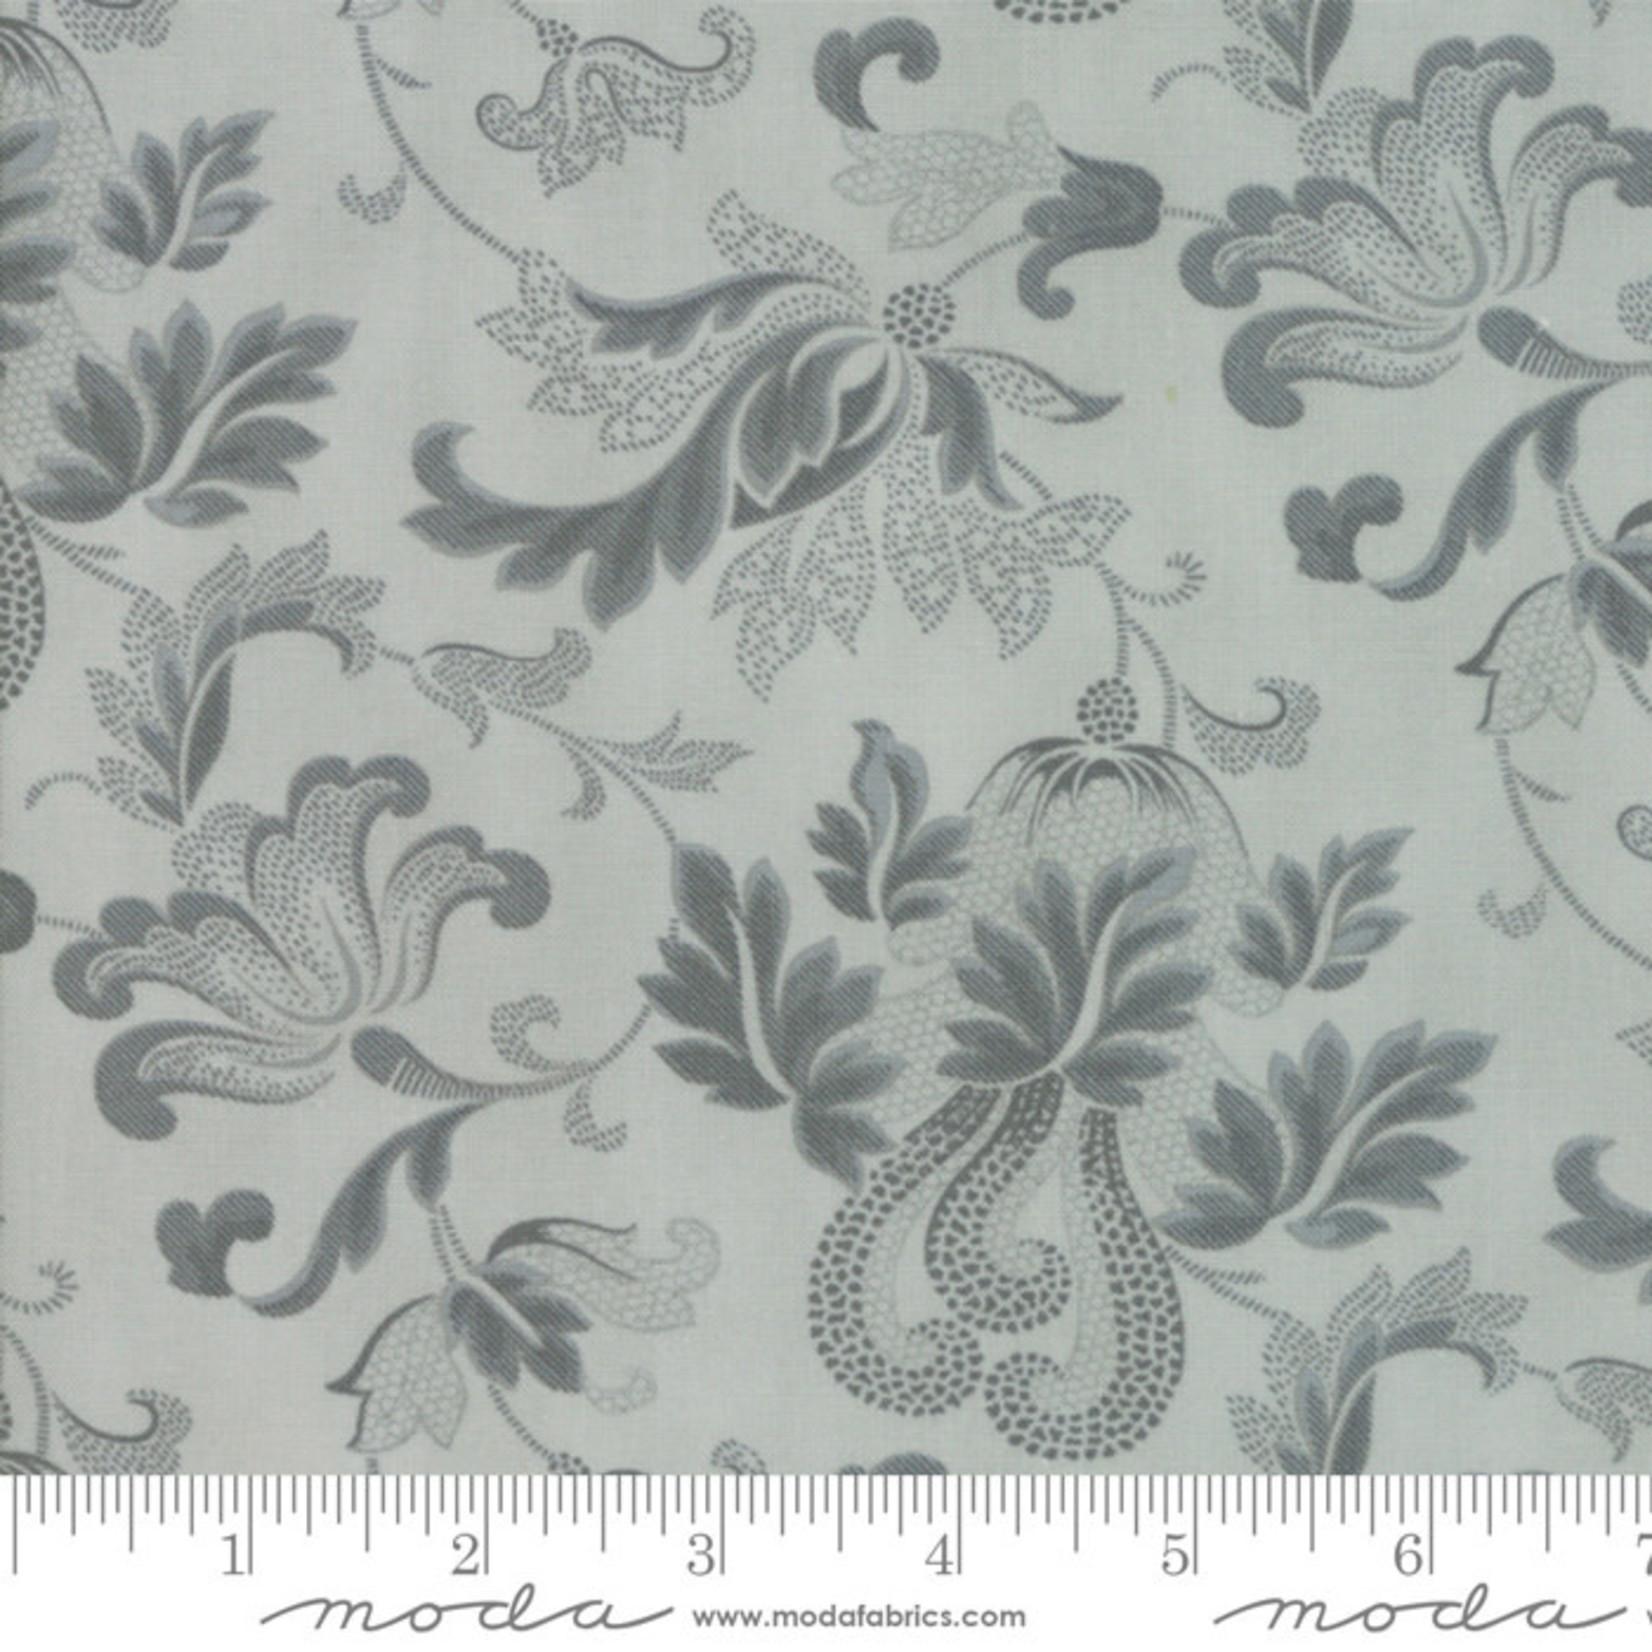 Moda Fabrics 3 Sisters - Rosewood - Flourish - Frost